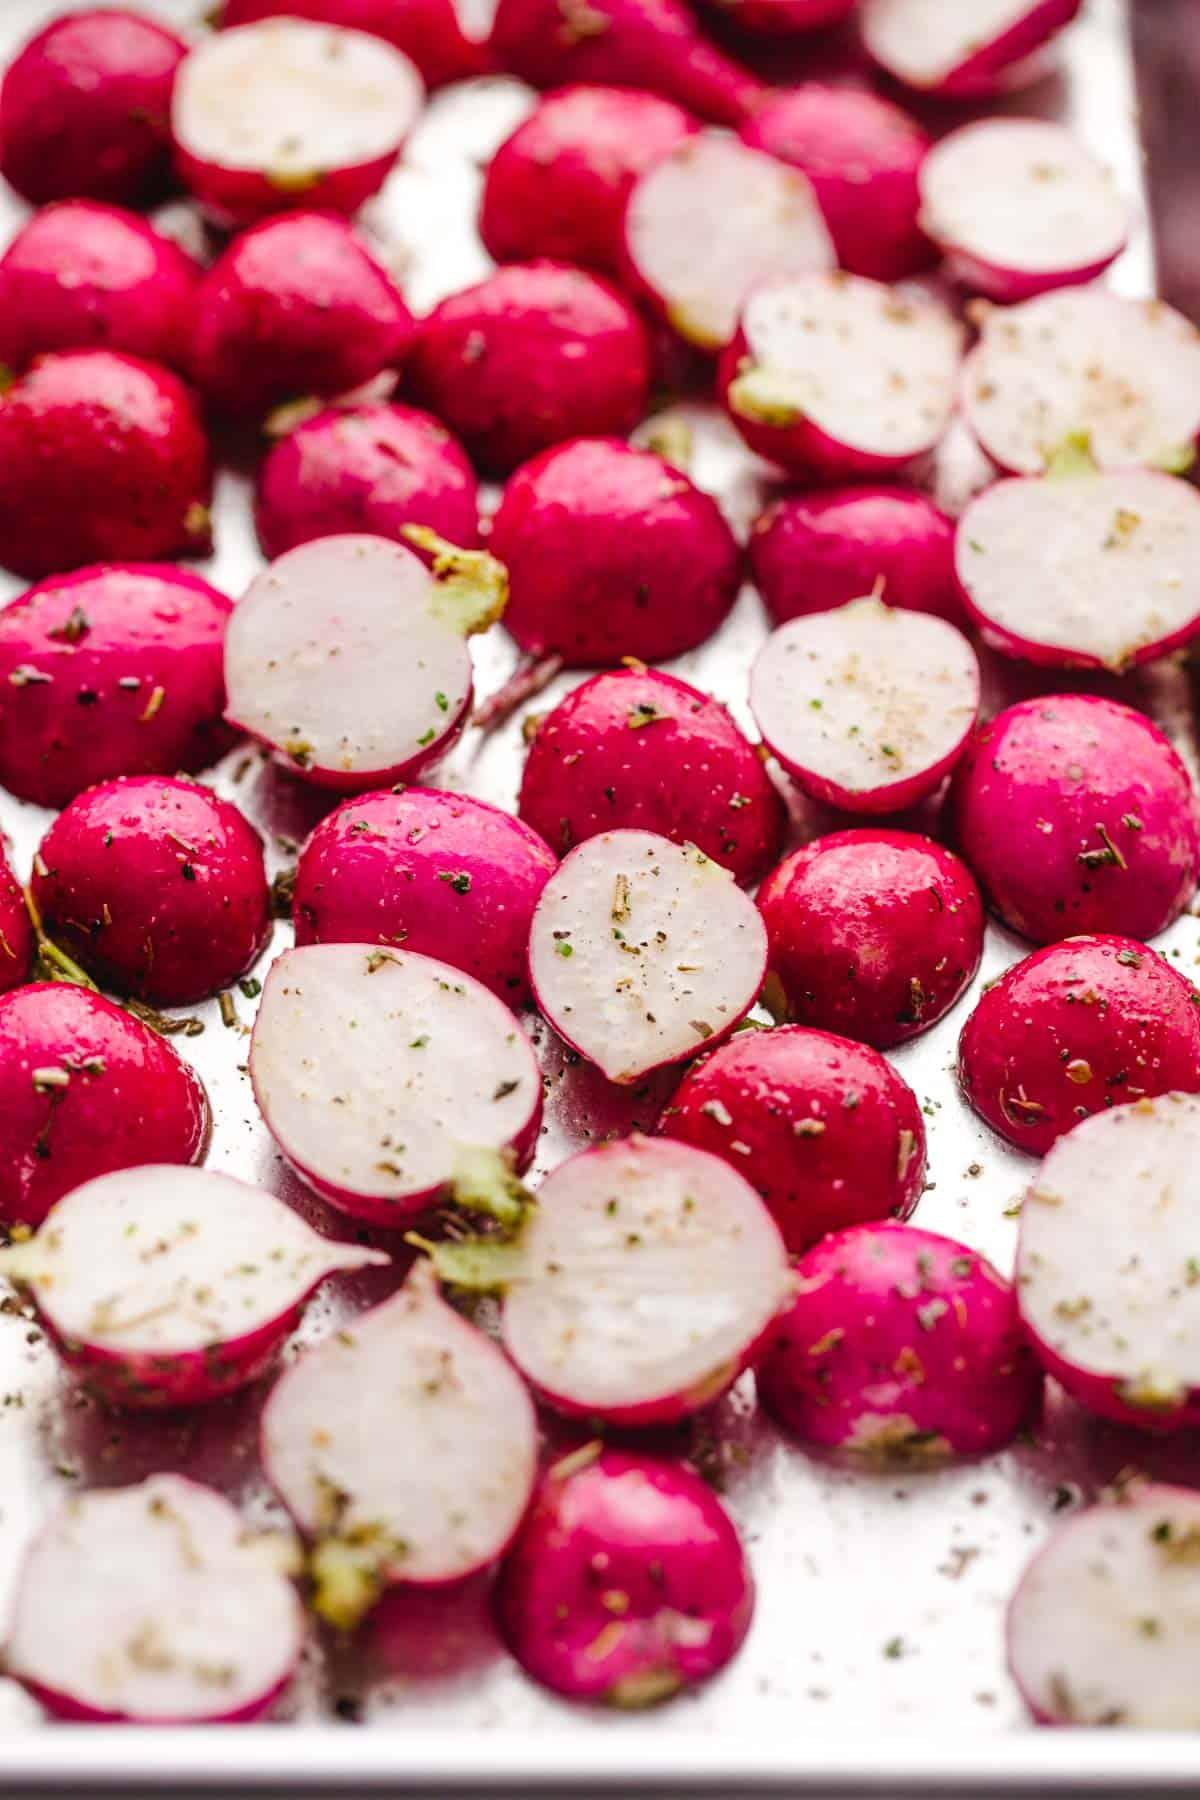 Seasoned radishes on a sheet pan before roasting